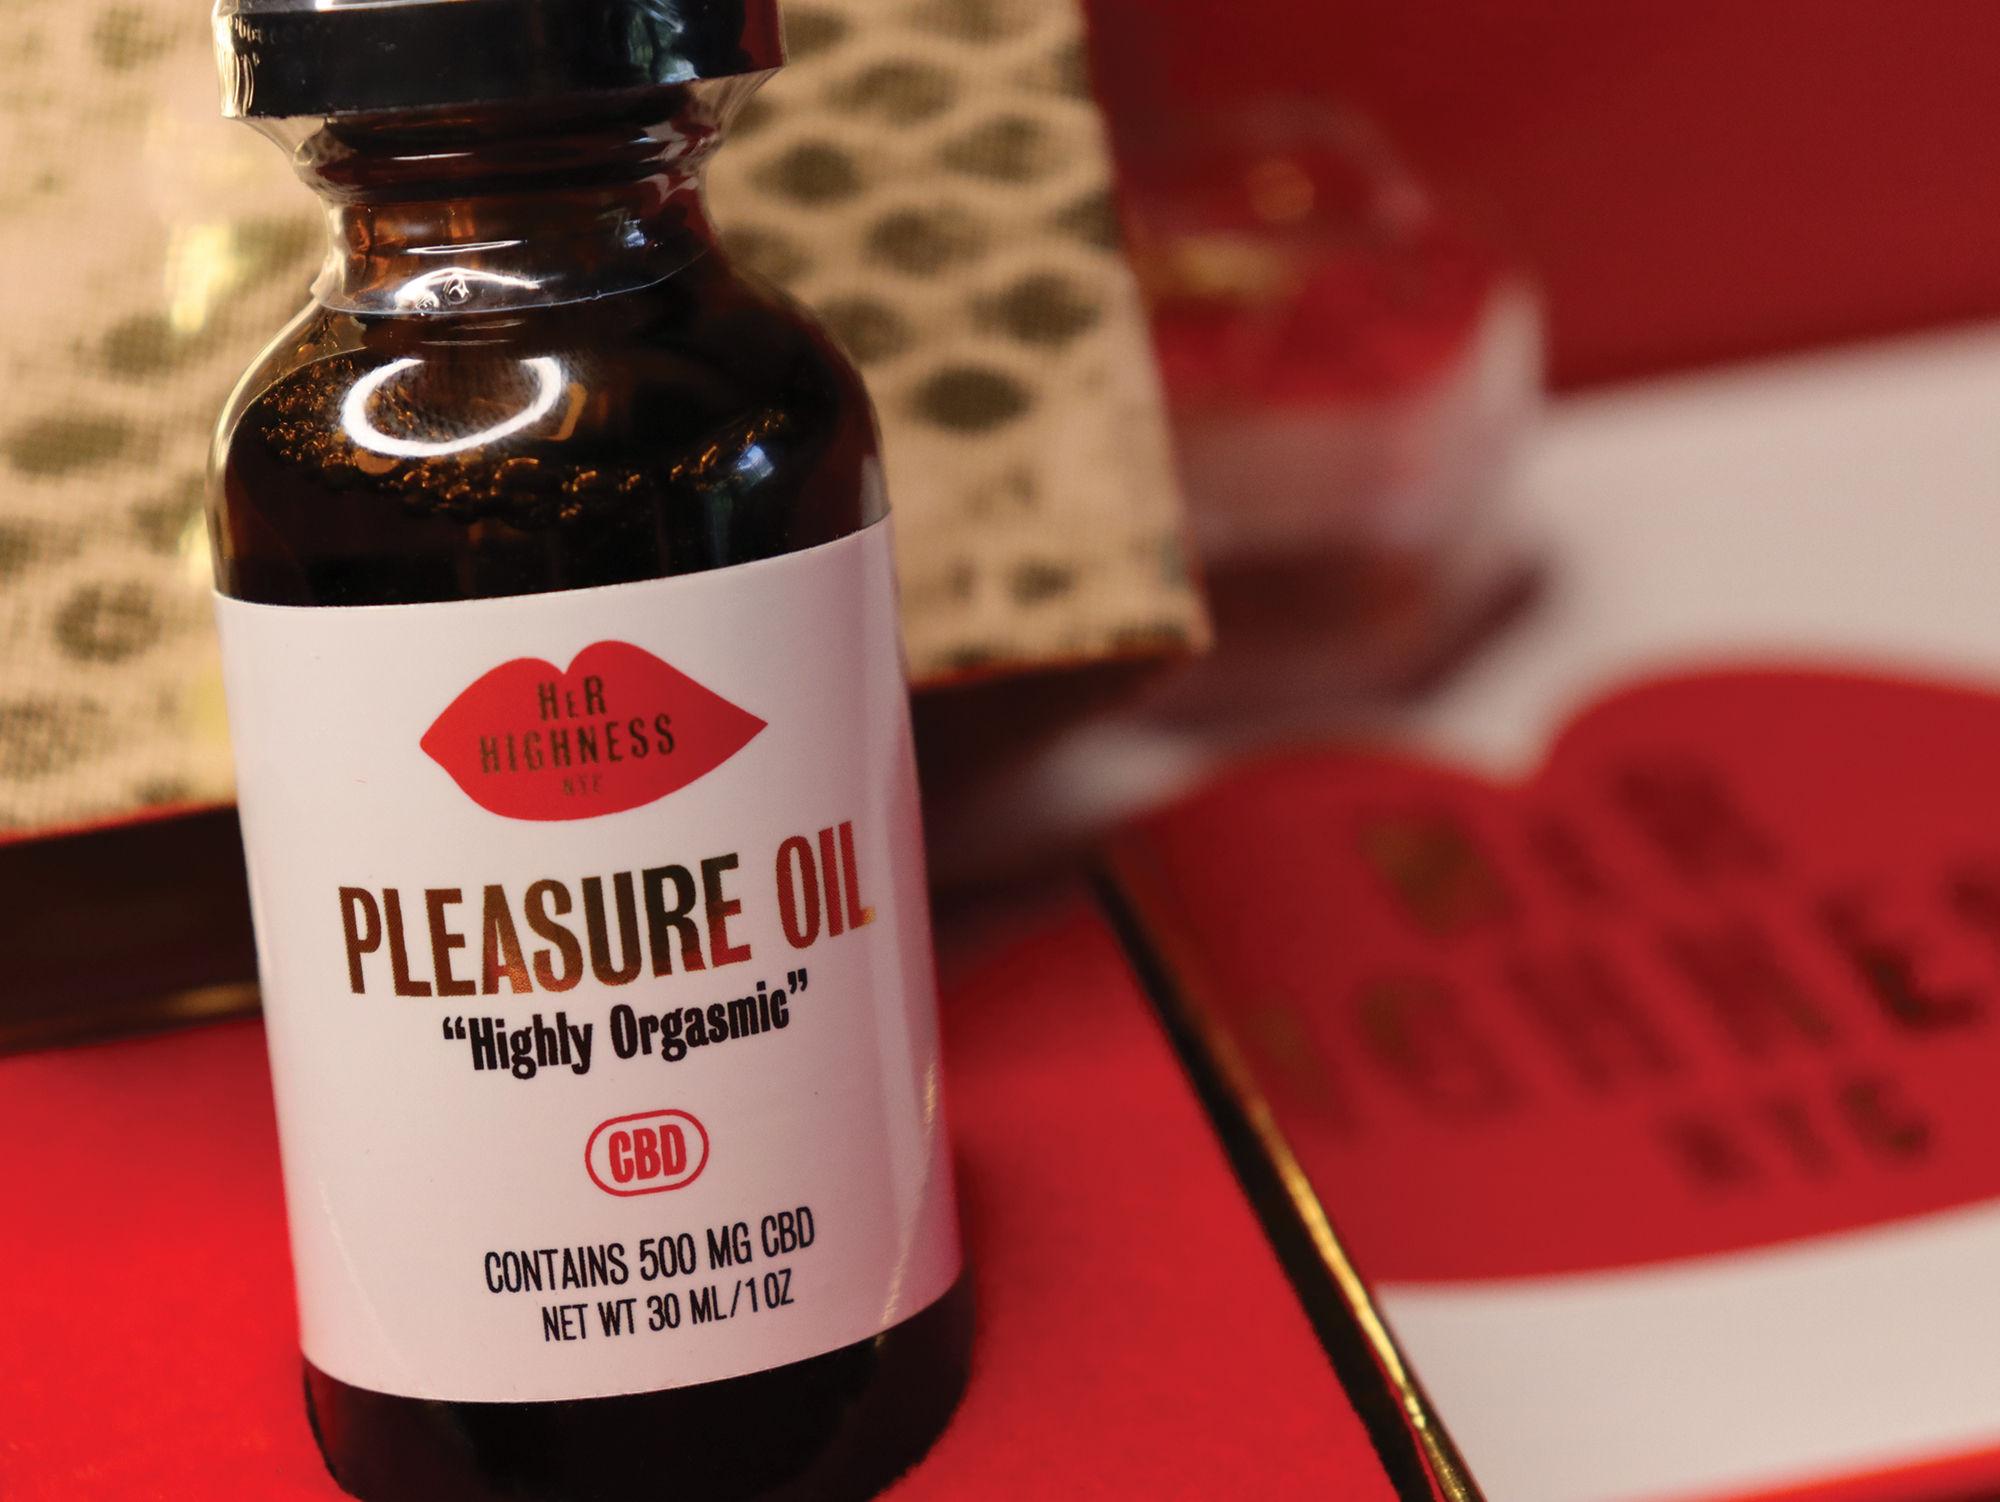 Highly Orgasmic Pleasure Oil